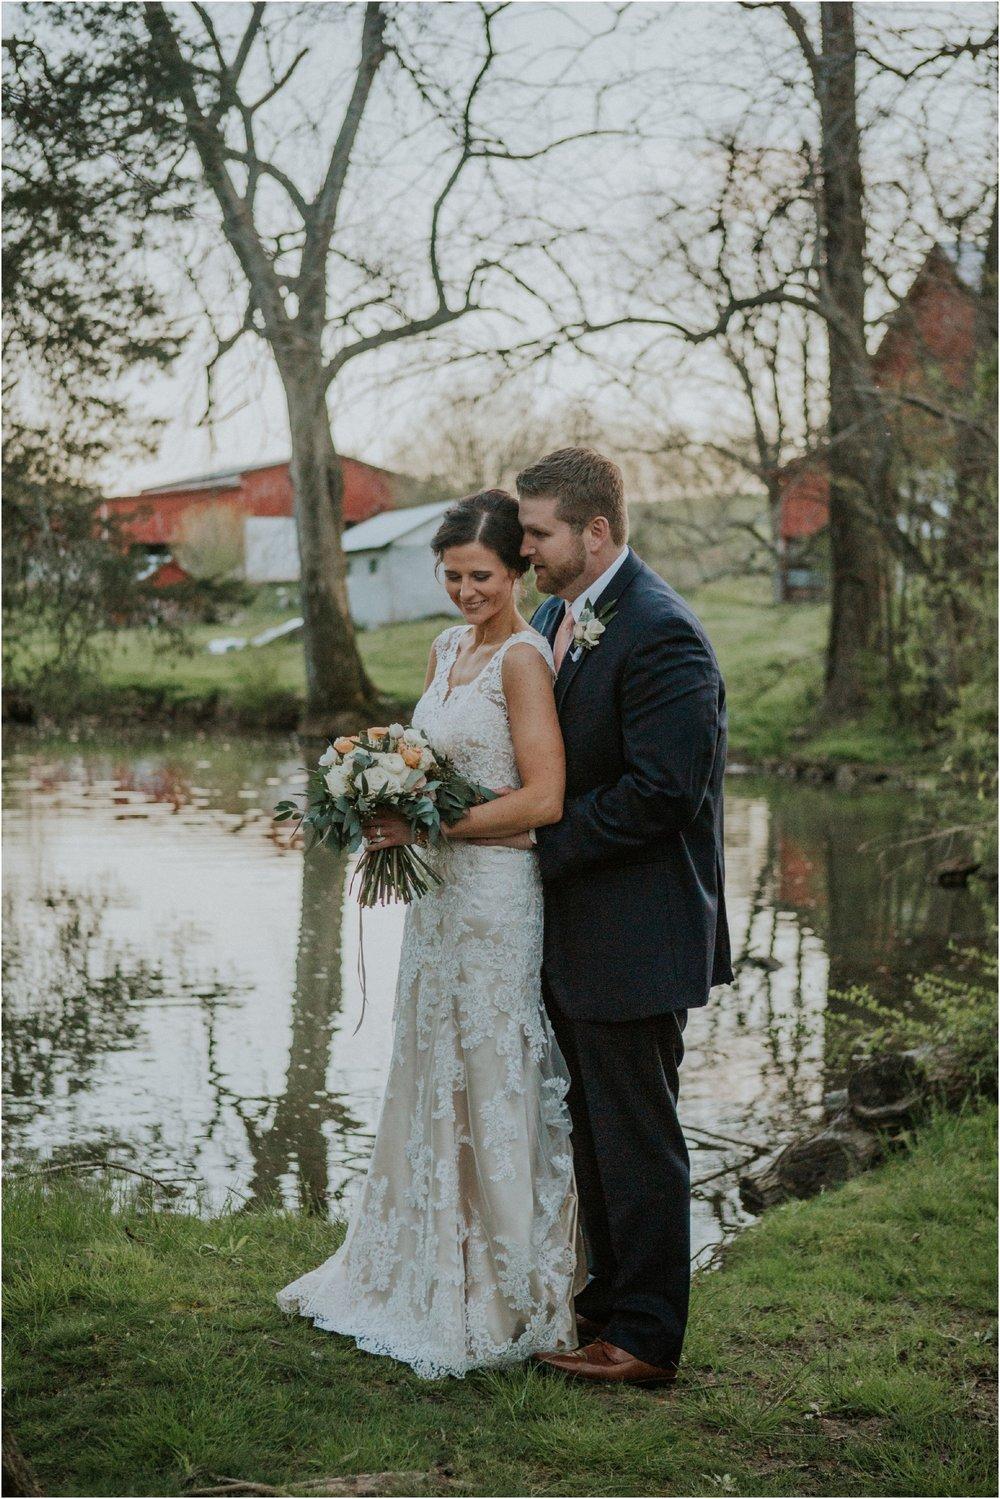 millstone-limestone-tn-tennessee-rustic-outdoors-pastel-lodge-cabin-venue-wedding-katy-sergent-photographer_0183.jpg